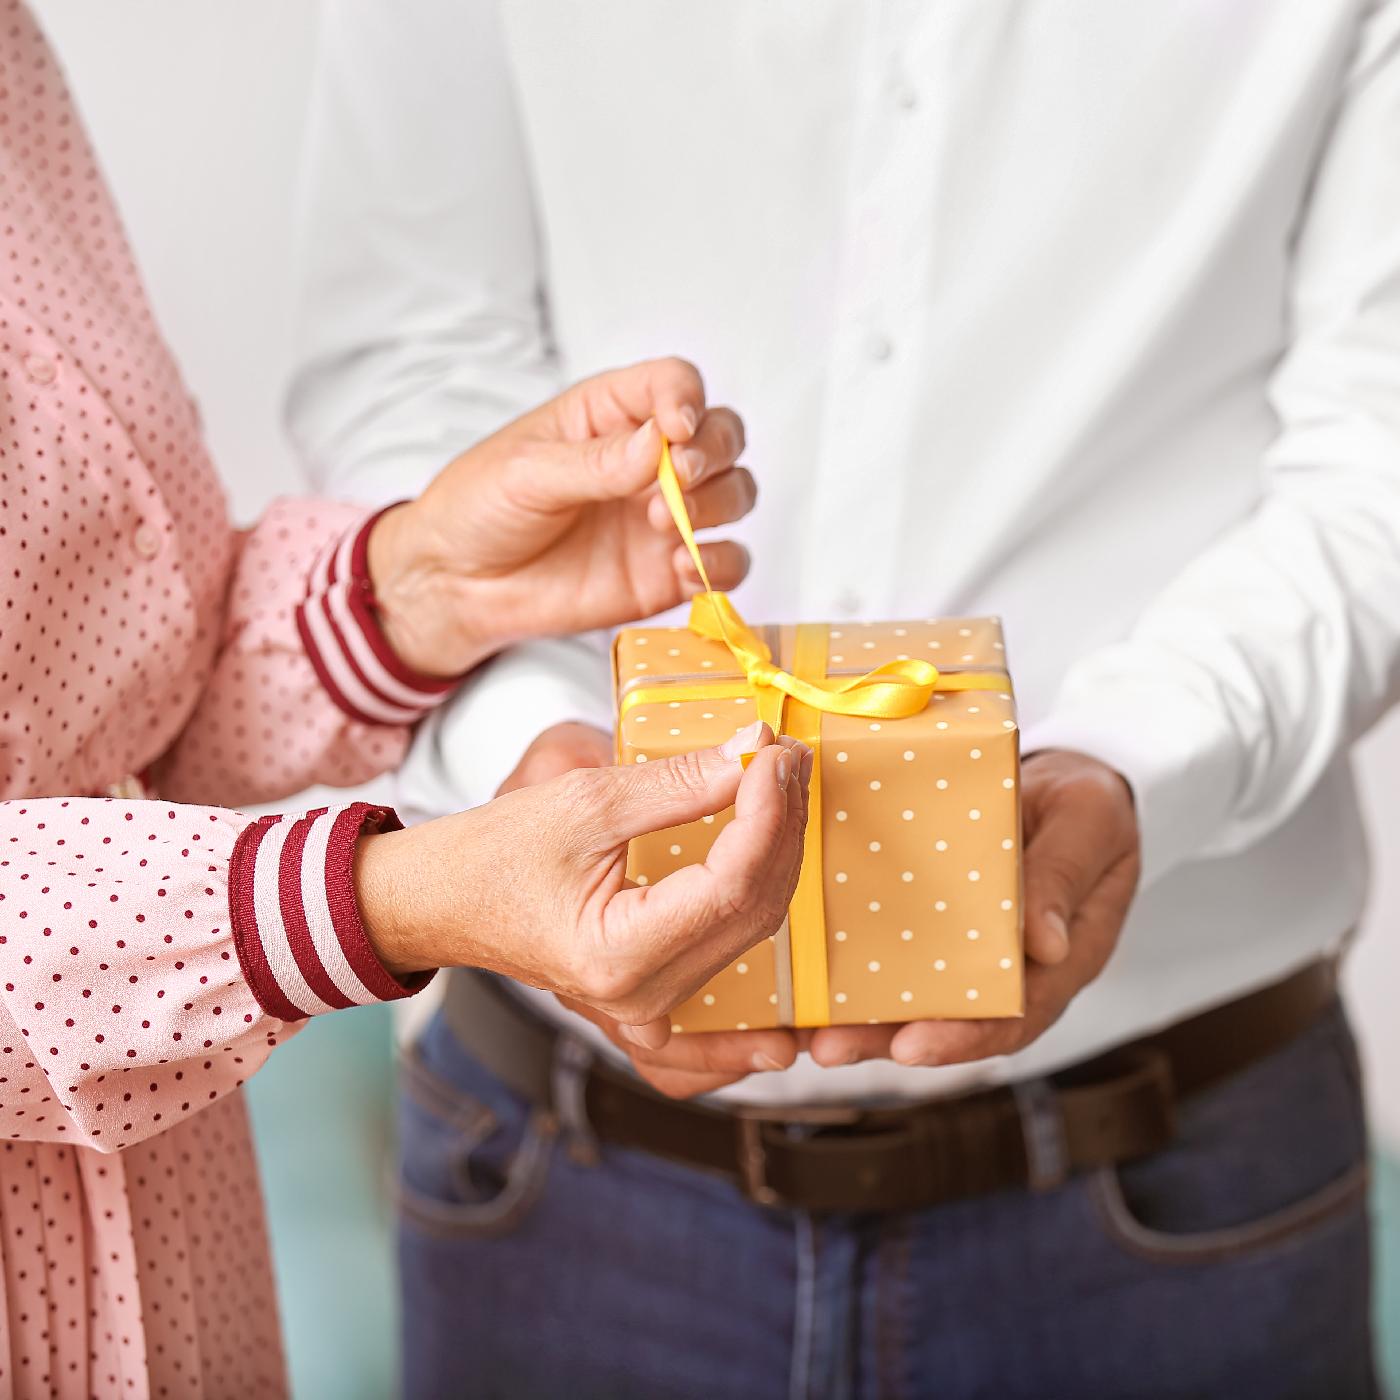 A woman's hands open a gift held by a man in a white shirt.